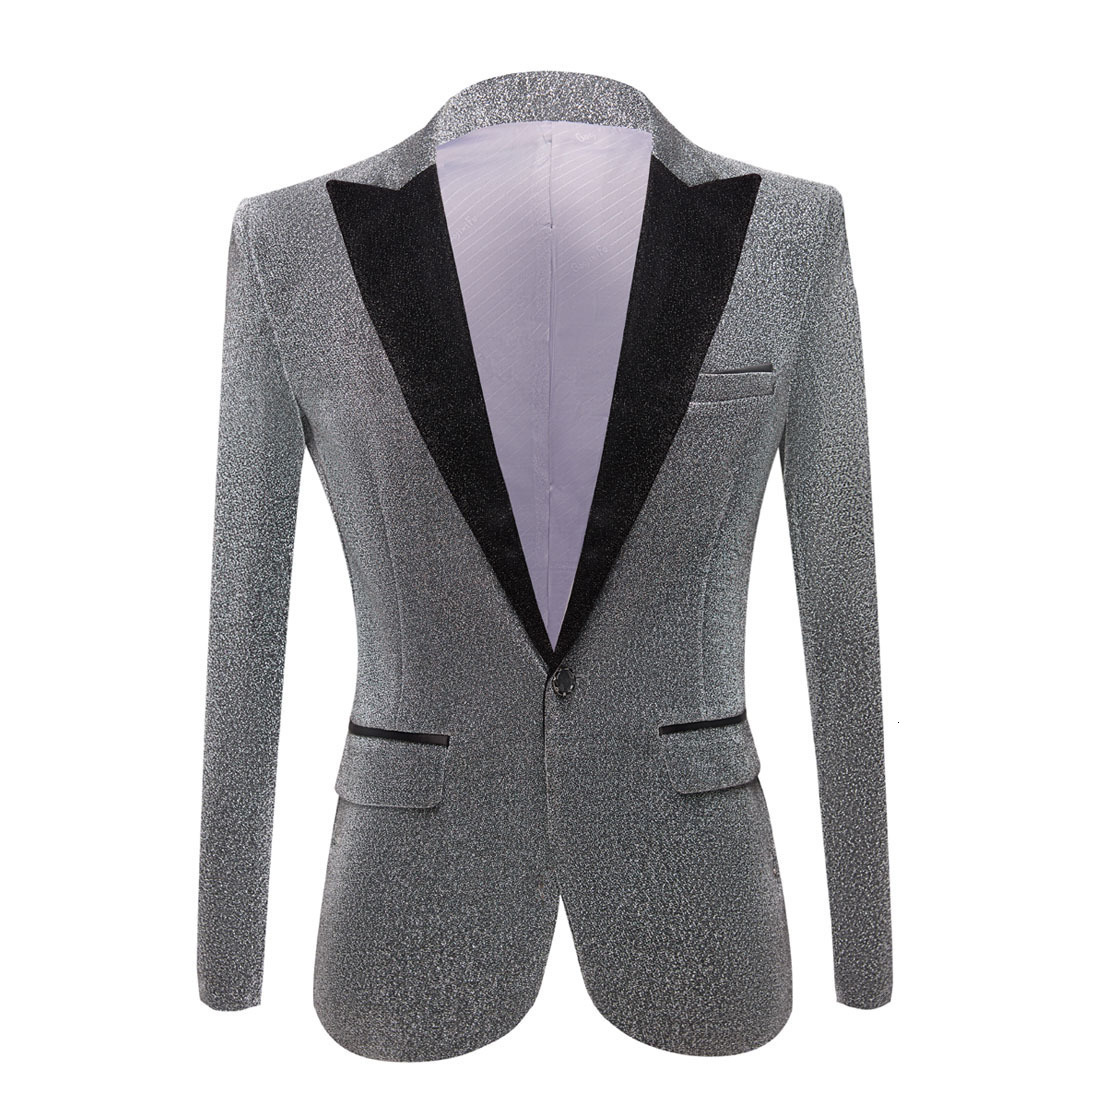 Aasop 2019 pyjtrl men's fashion shiny purple gold red black silver gray suit  jacket wedding groom prom singers blazers men blazer slim fit ly191203 from